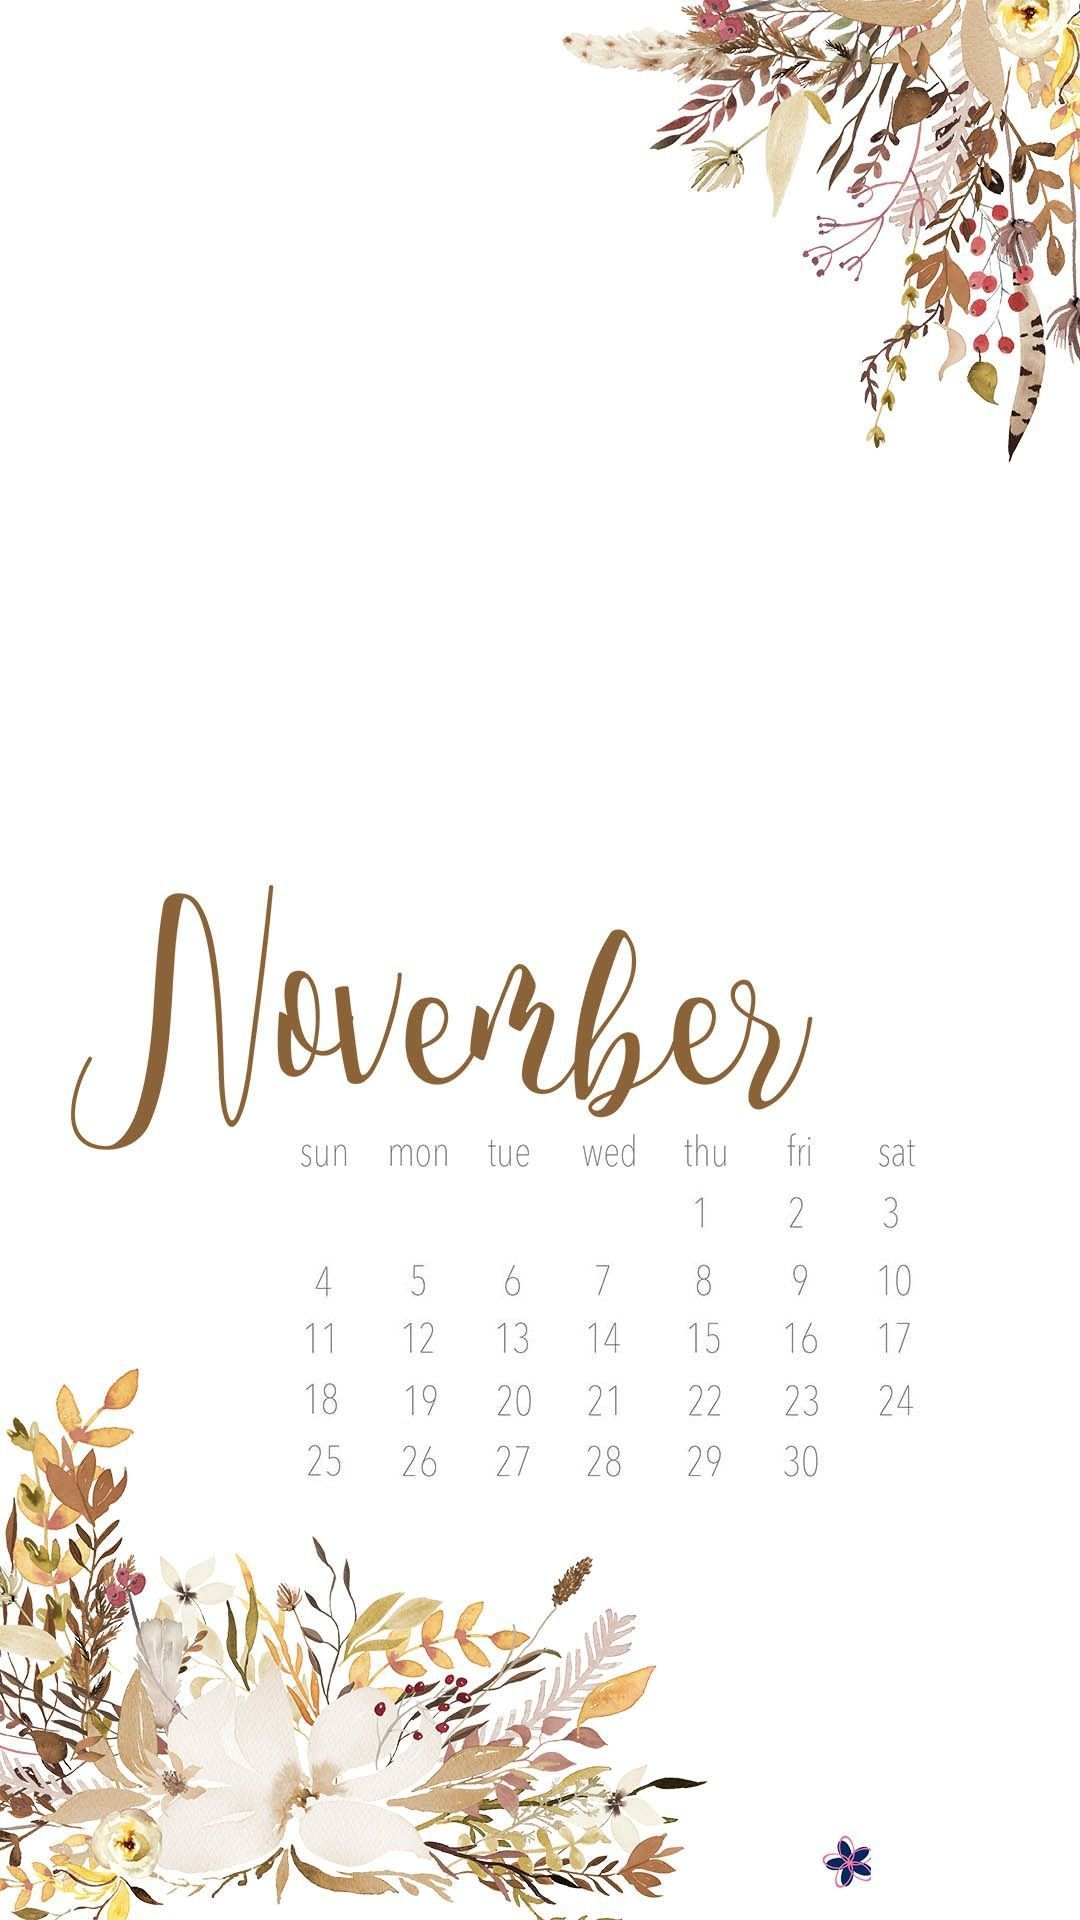 November 2019 happyfallyallwallpaper Iphone wallpaper